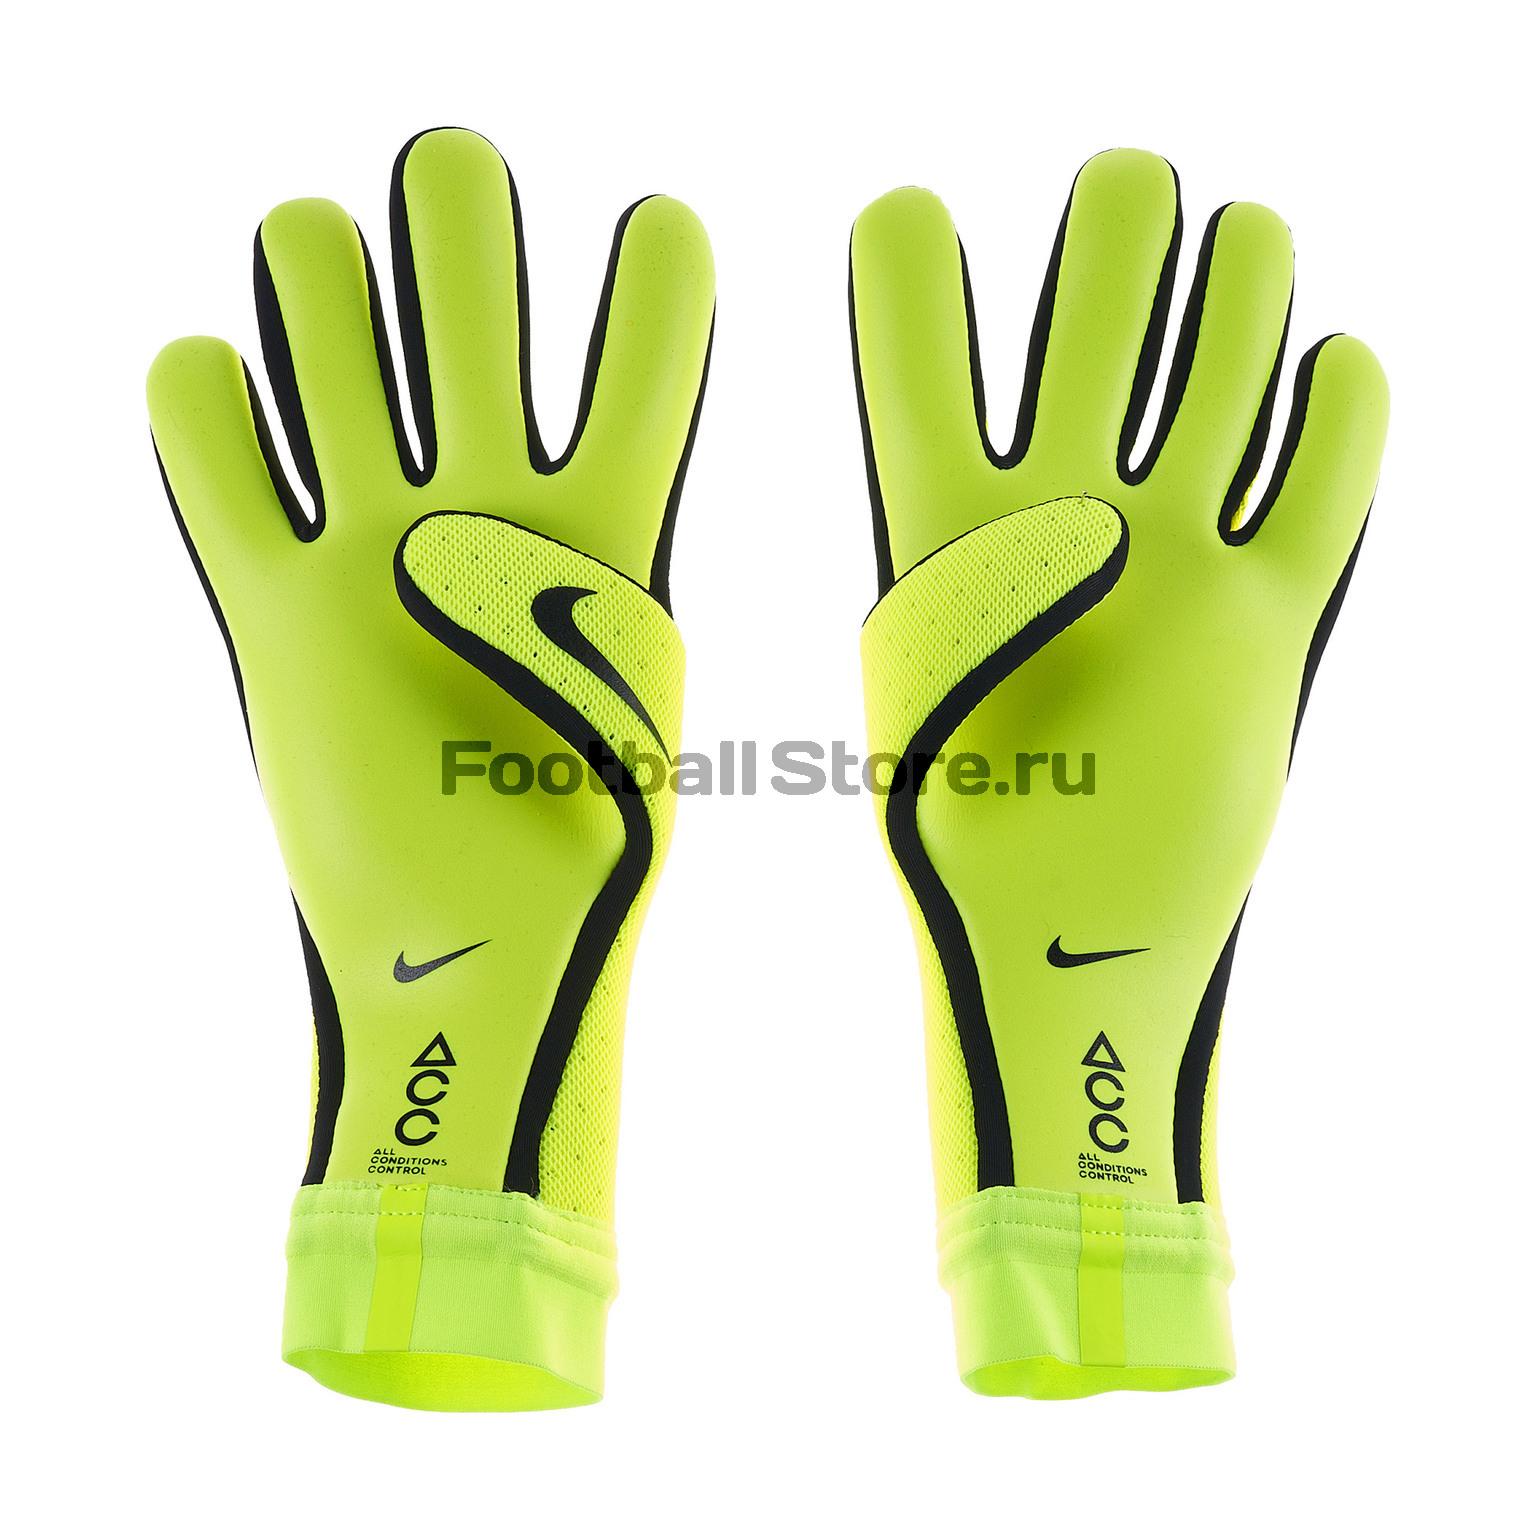 ... Перчатки вратарские Nike GK Mercurial Touch Elite GS0356-702. О ТОВАРЕ   РАСЧЕТ ДОСТАВКИ e42122420dc